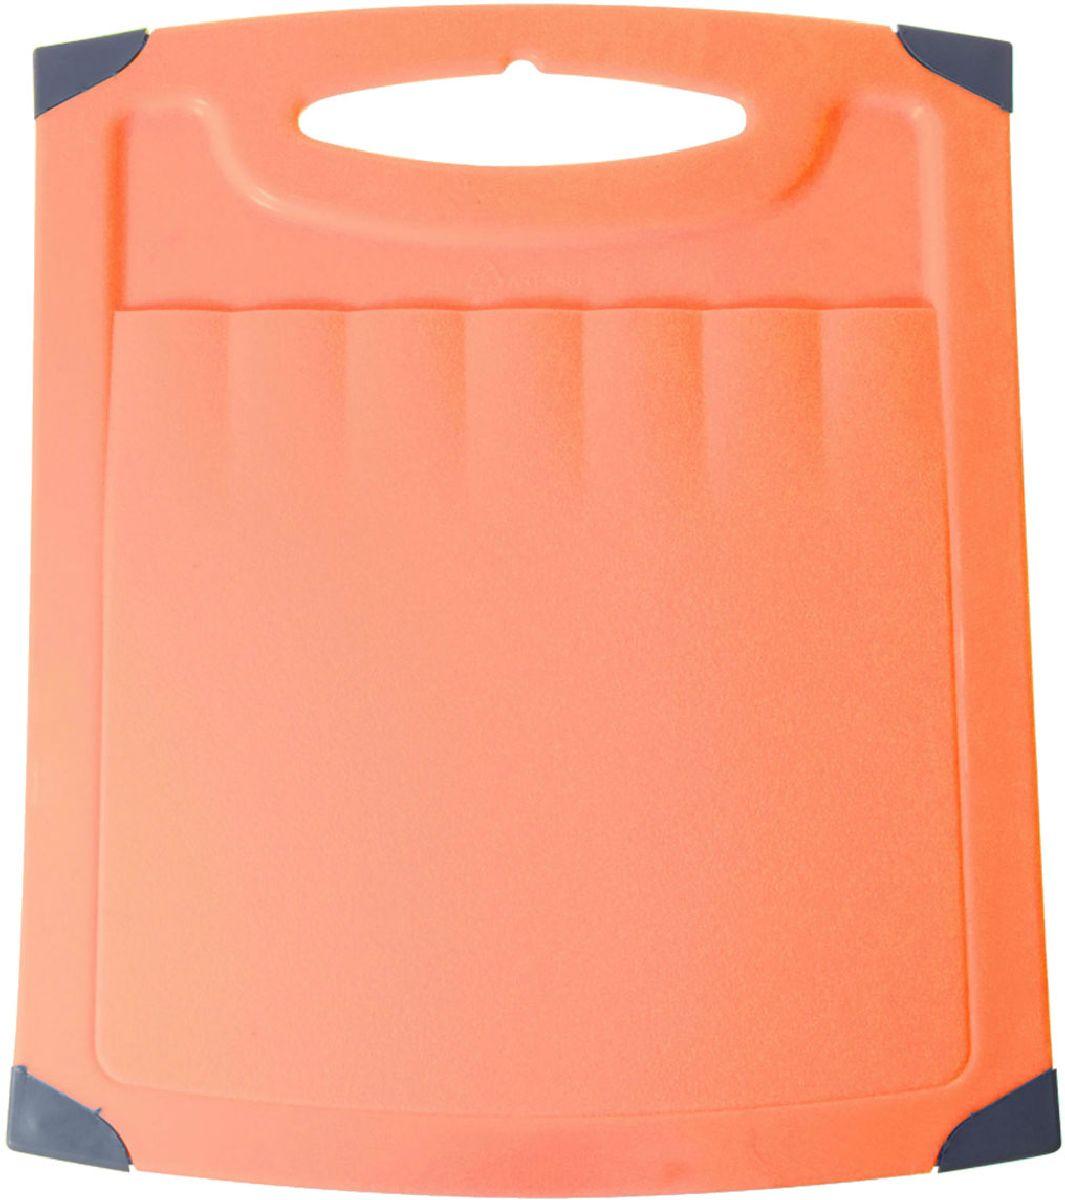 "Доска разделочная Plastic Centre ""Люкс"", цвет: оранжевый, 40 х 30 см"